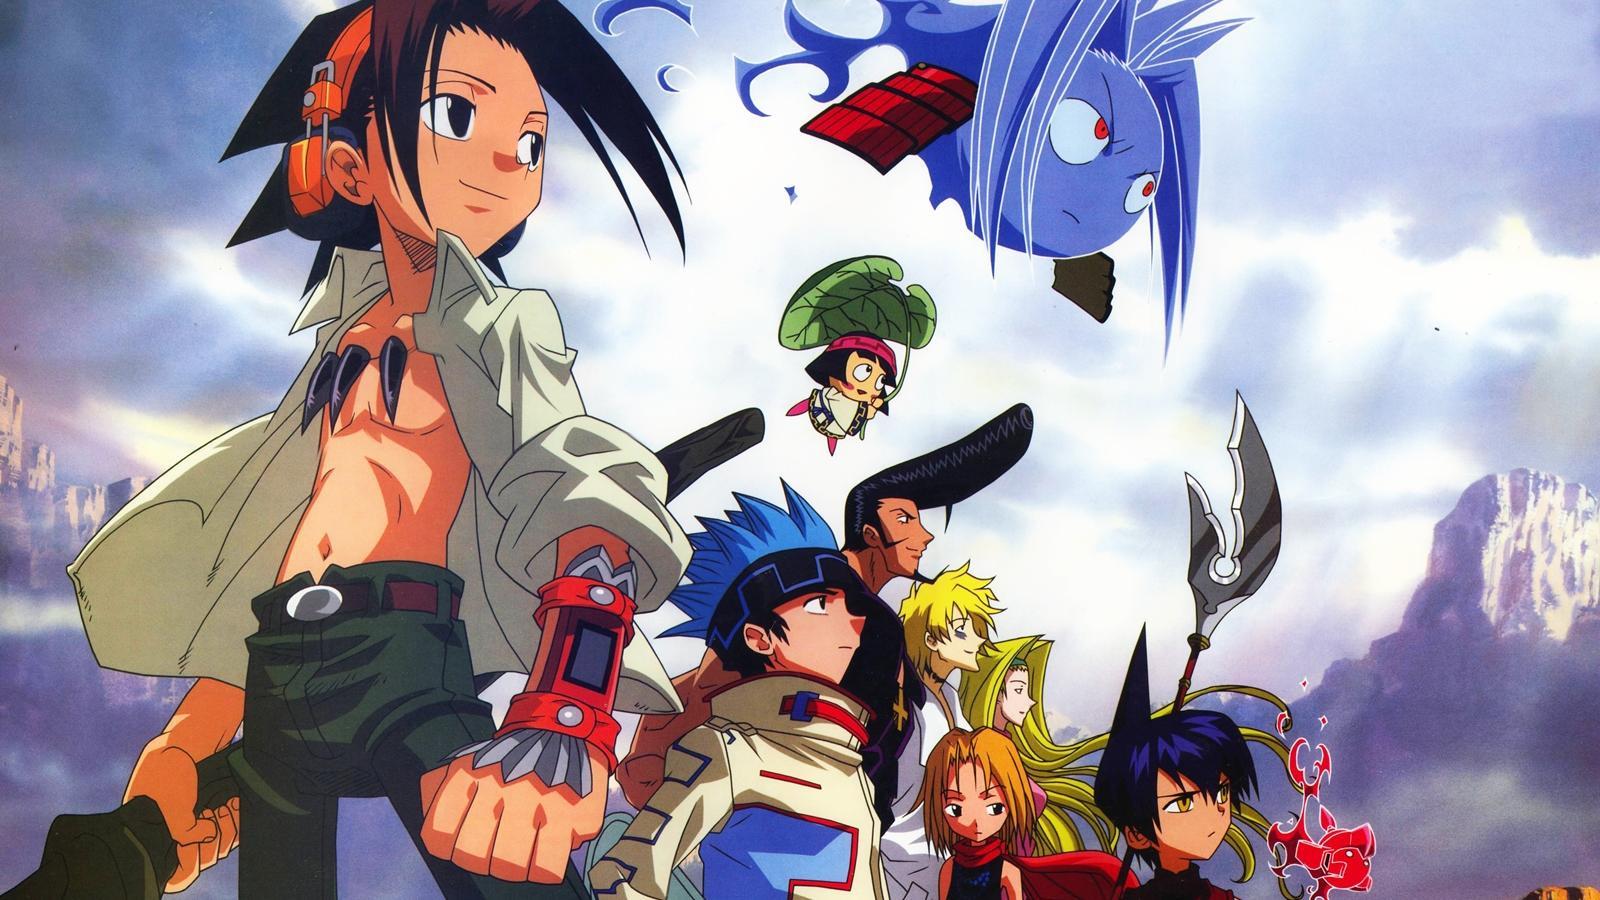 Anime Shaman King (US)